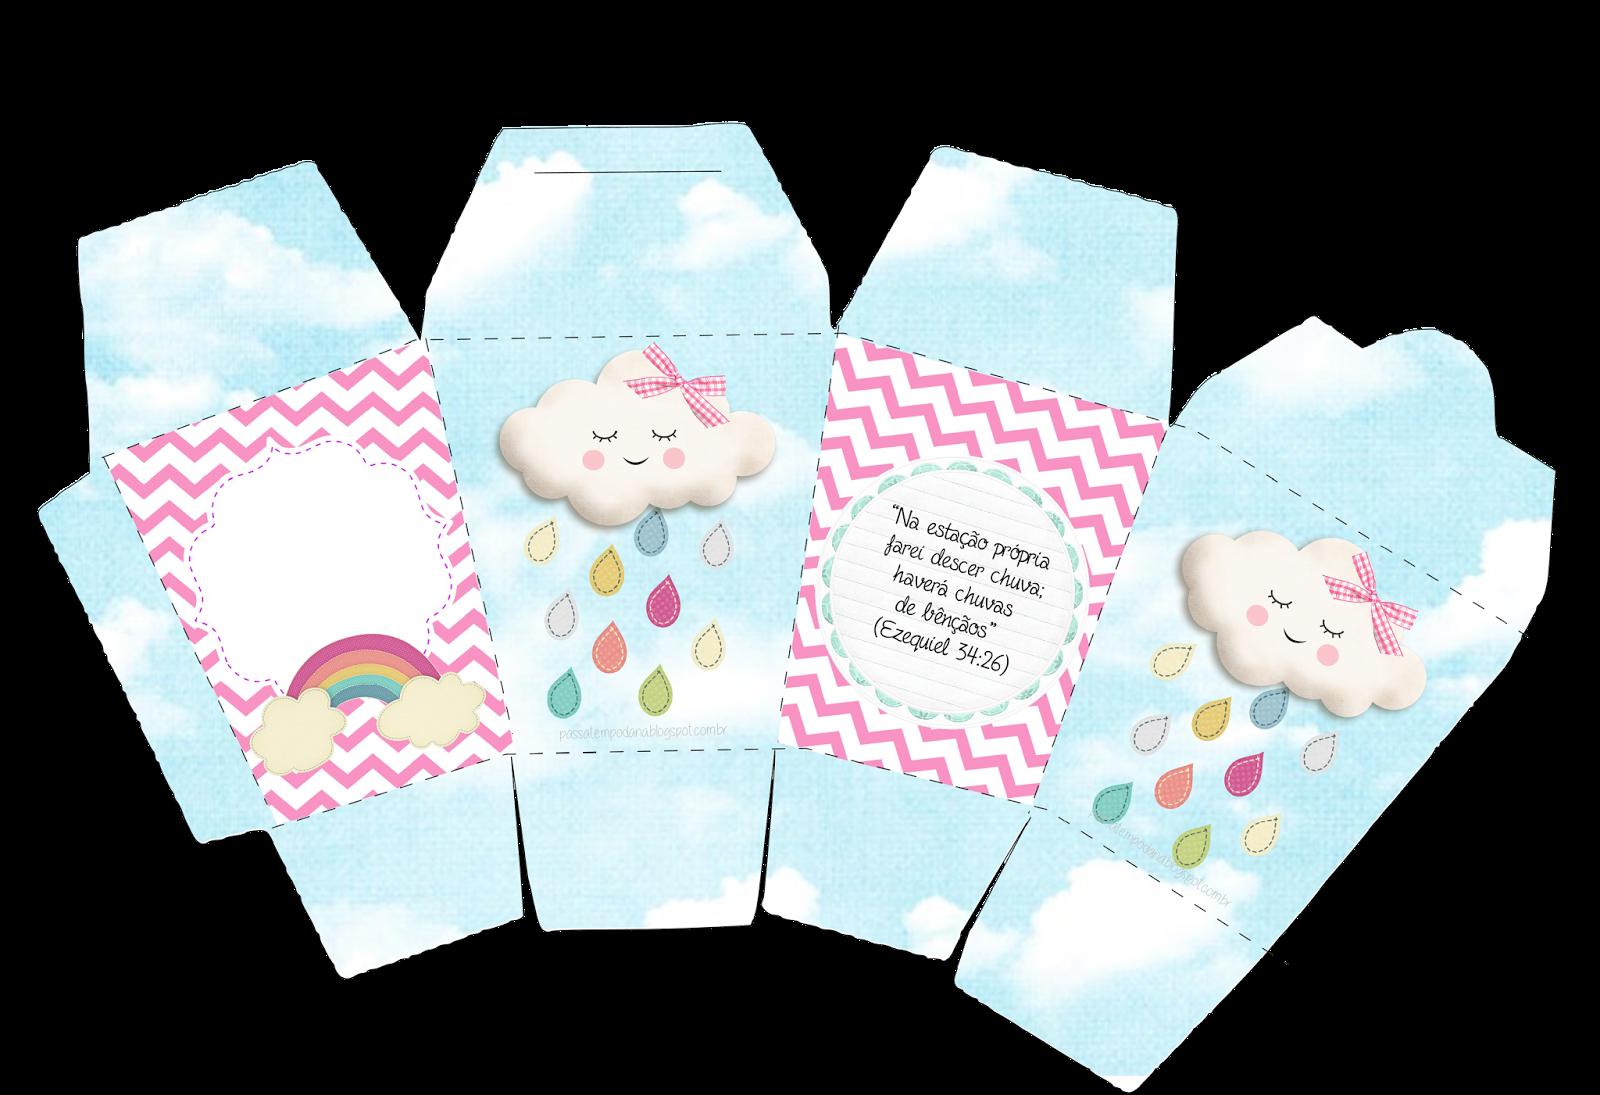 f217a94b13dd4b Passatempo da Ana: Micro Kit - Chuva de Bençãos | Baby Shower ideas ...